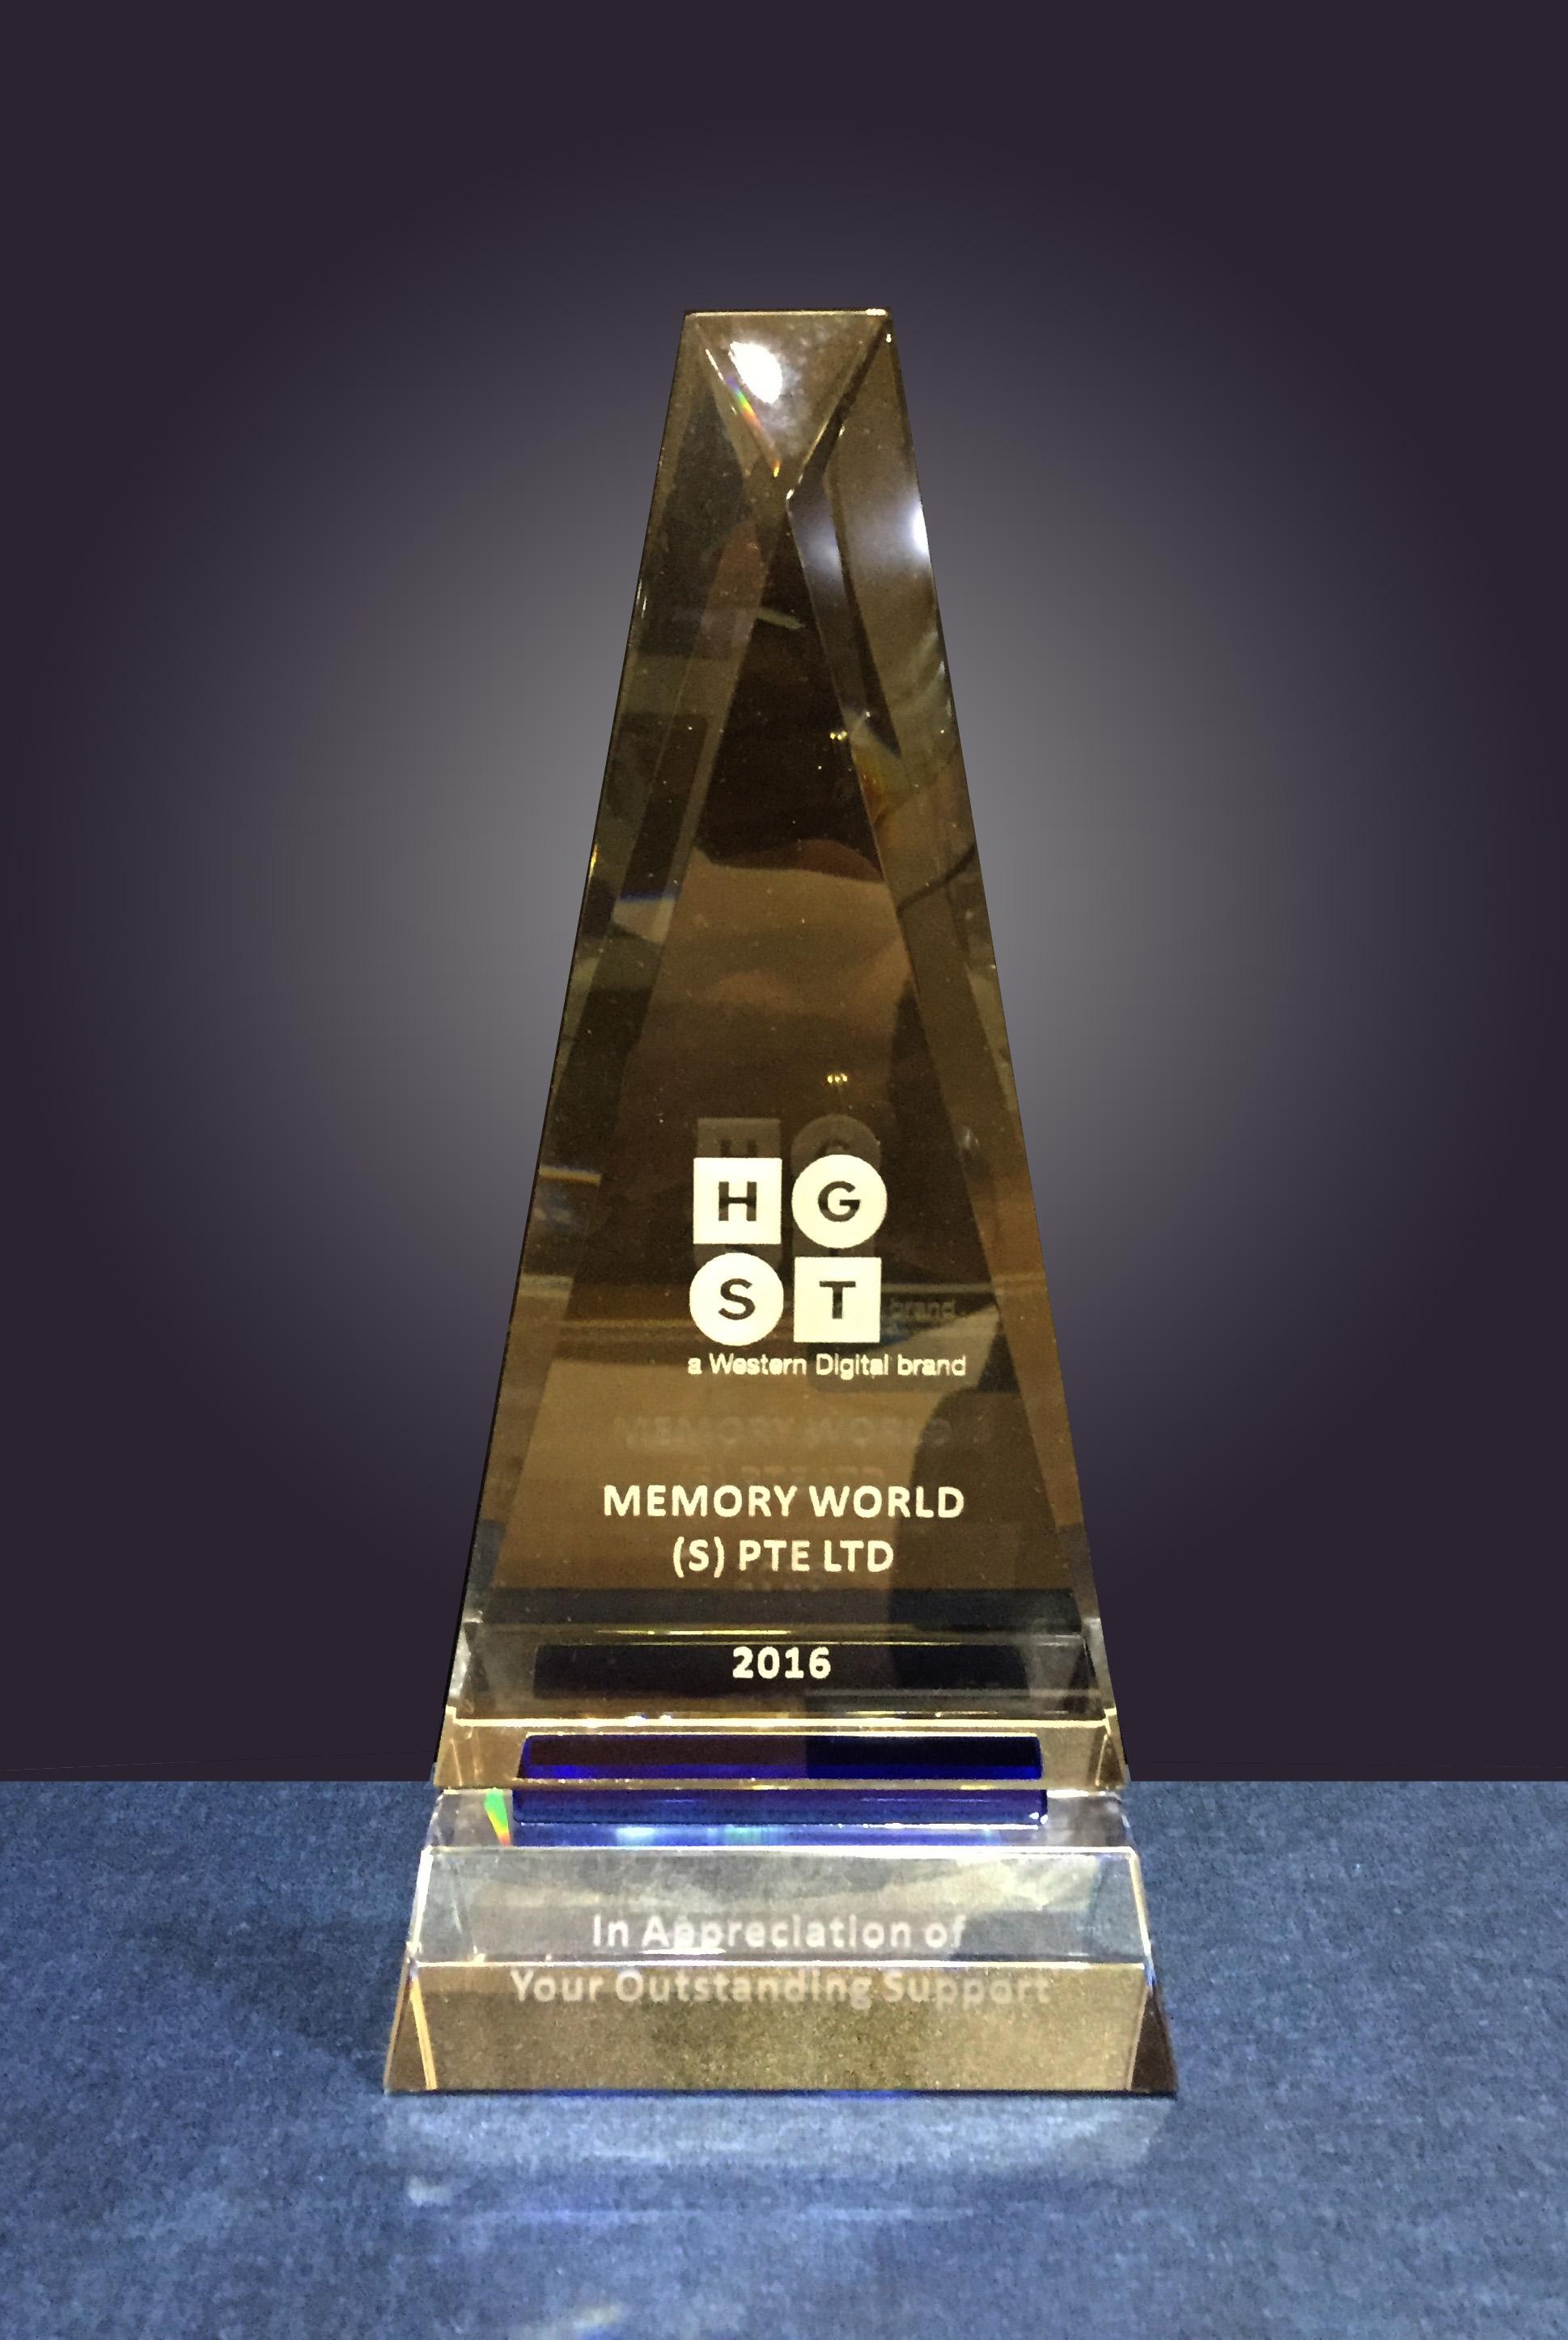 HGST Award